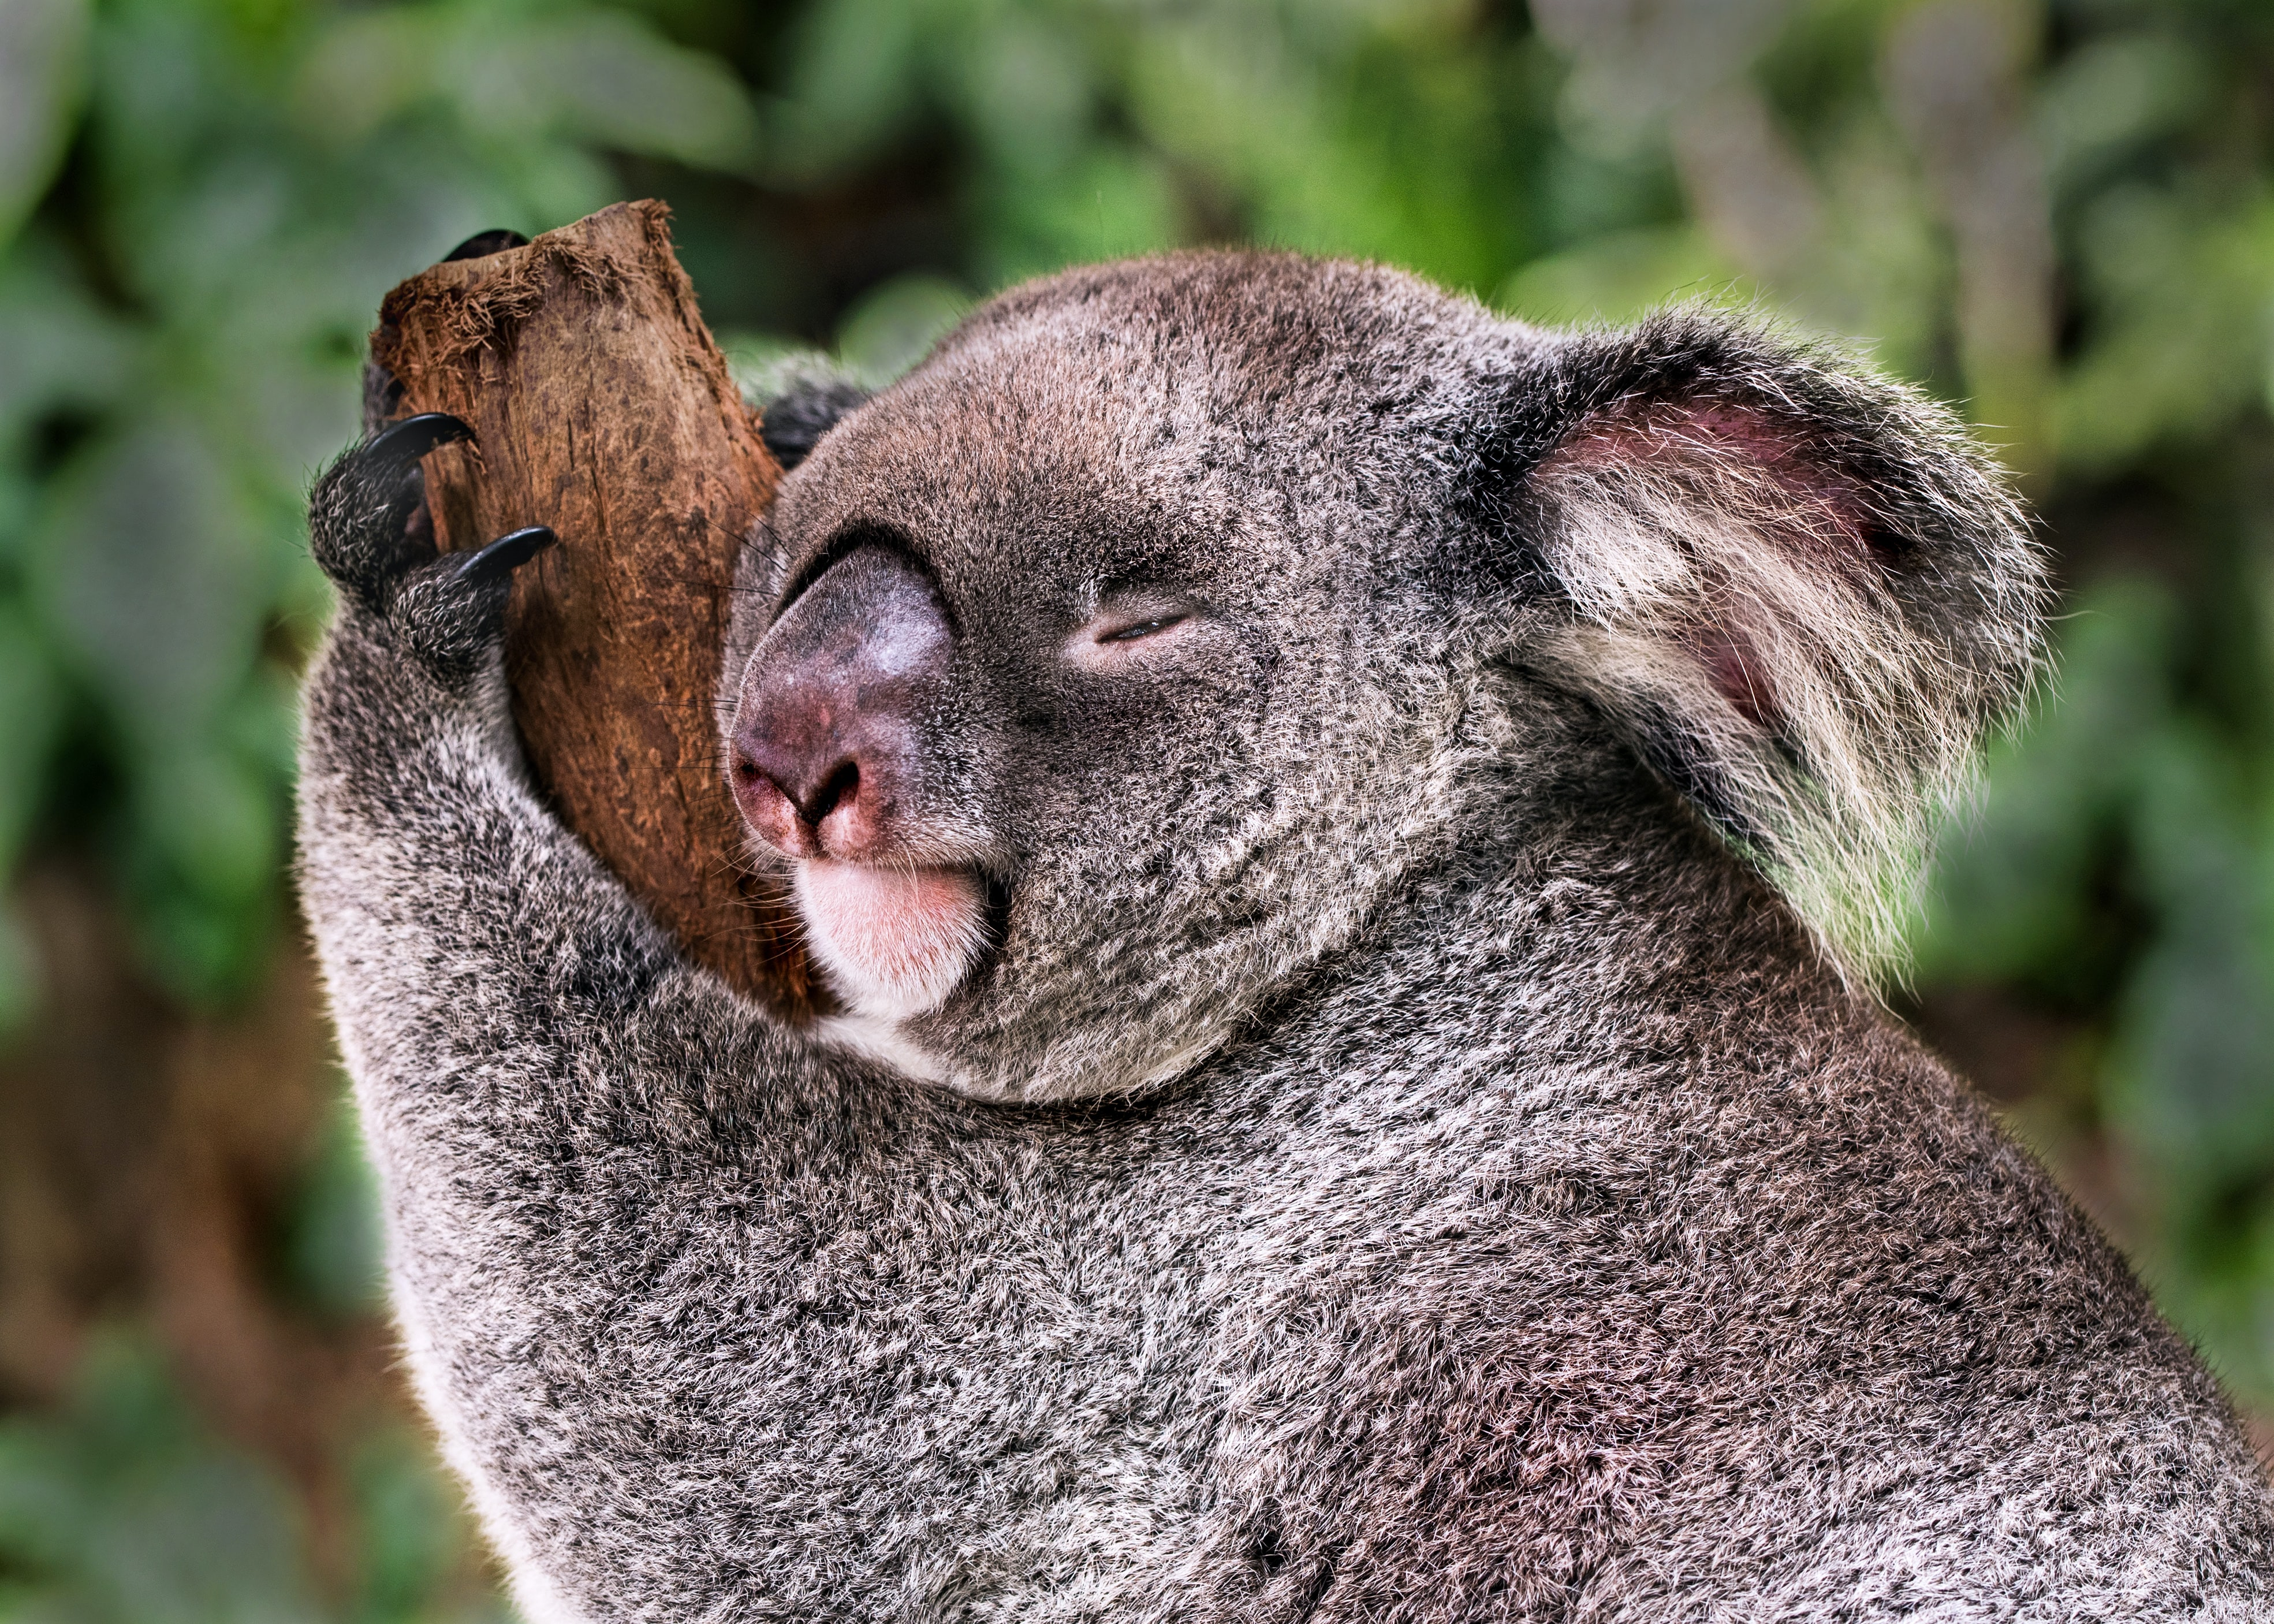 Koala bear clinging on tree branch